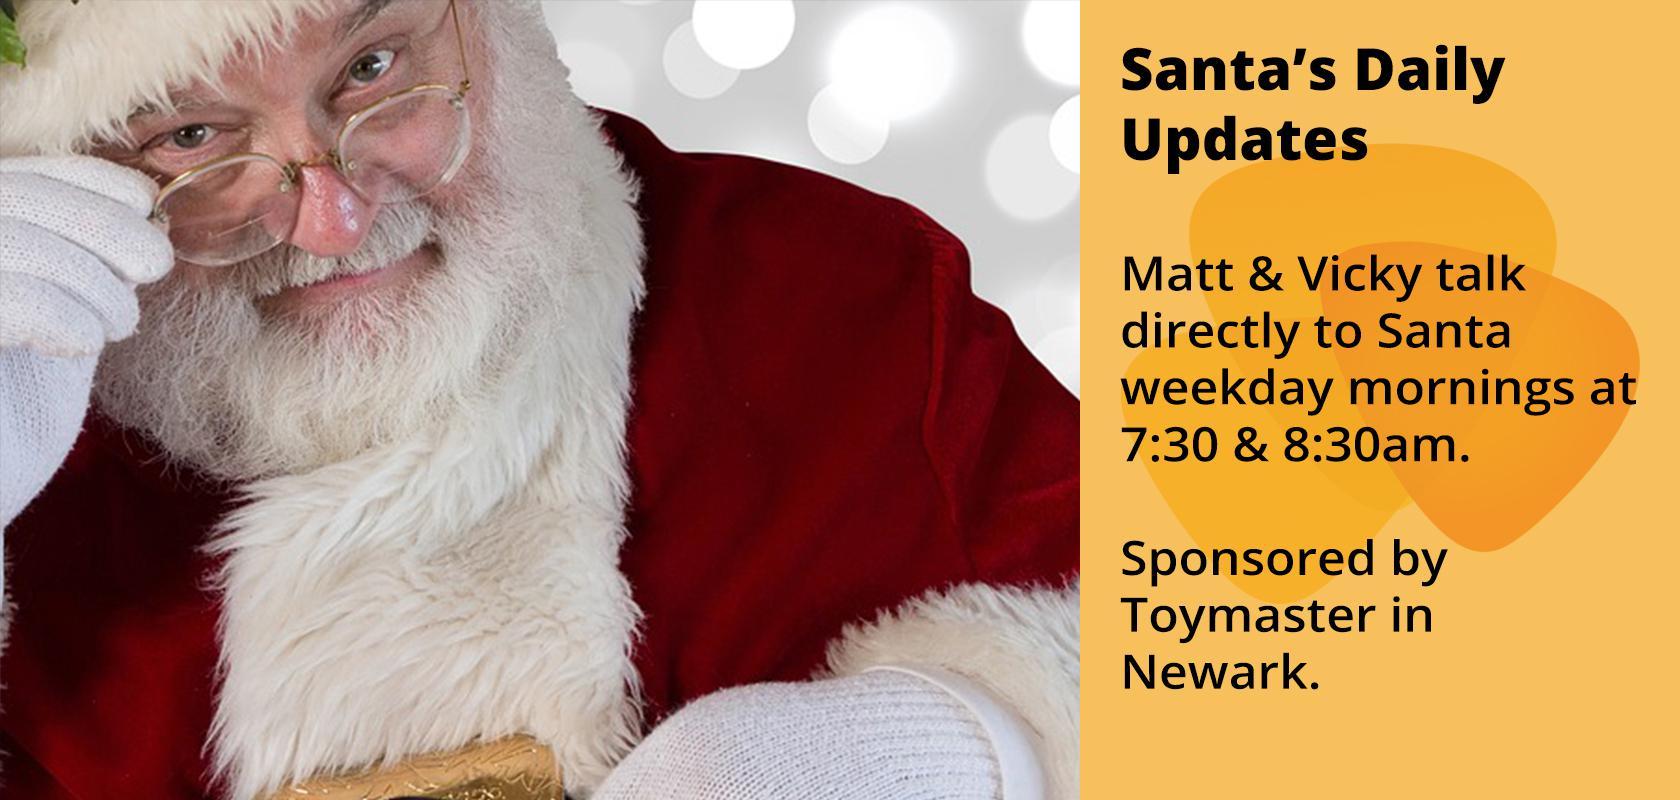 Santa's Daily Updates